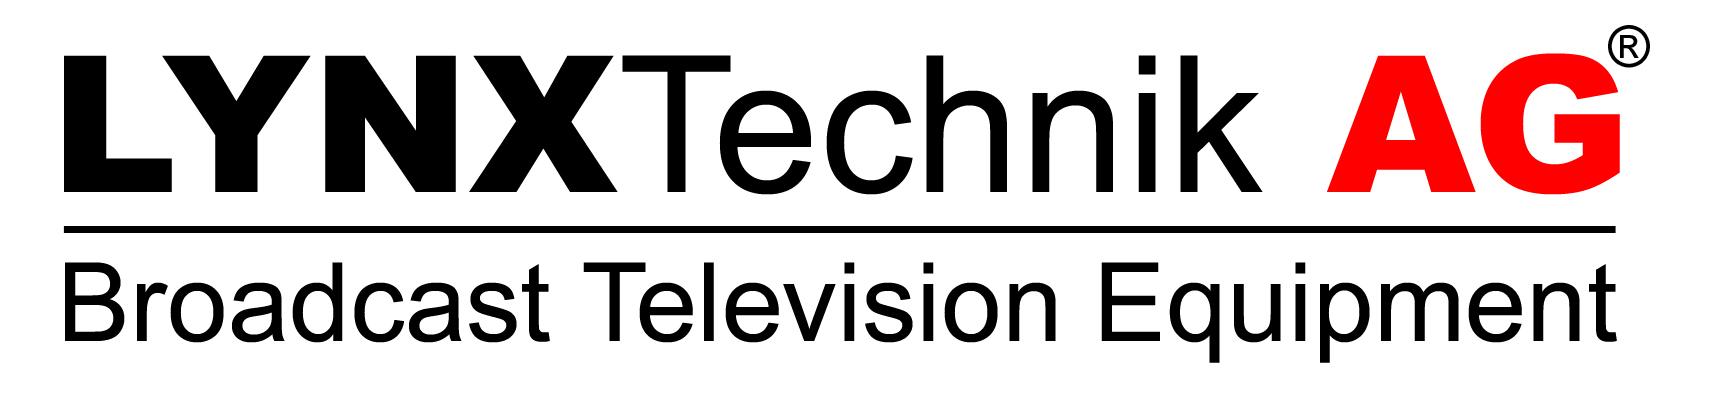 LYNX-Technik-Logo.jpg